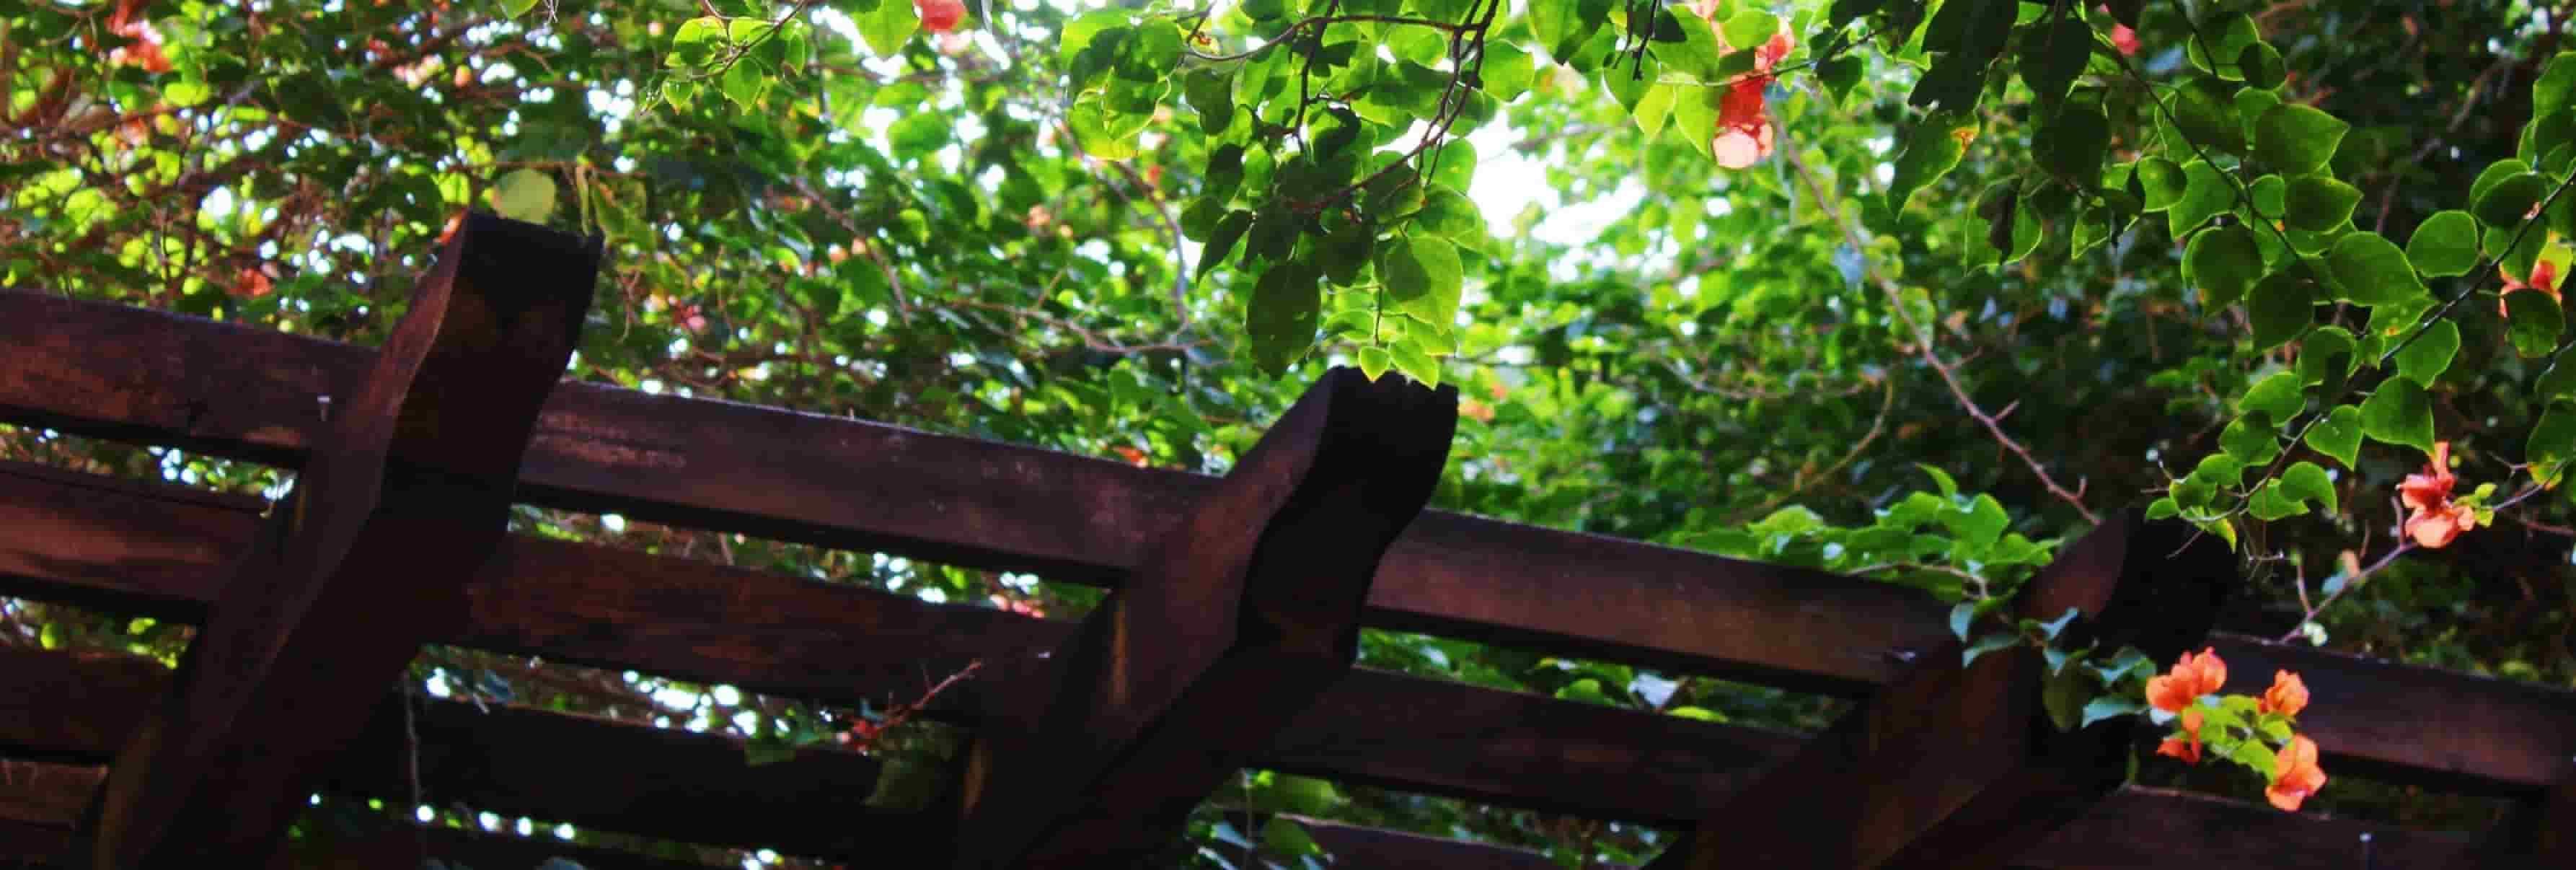 Garden Furniture Removal